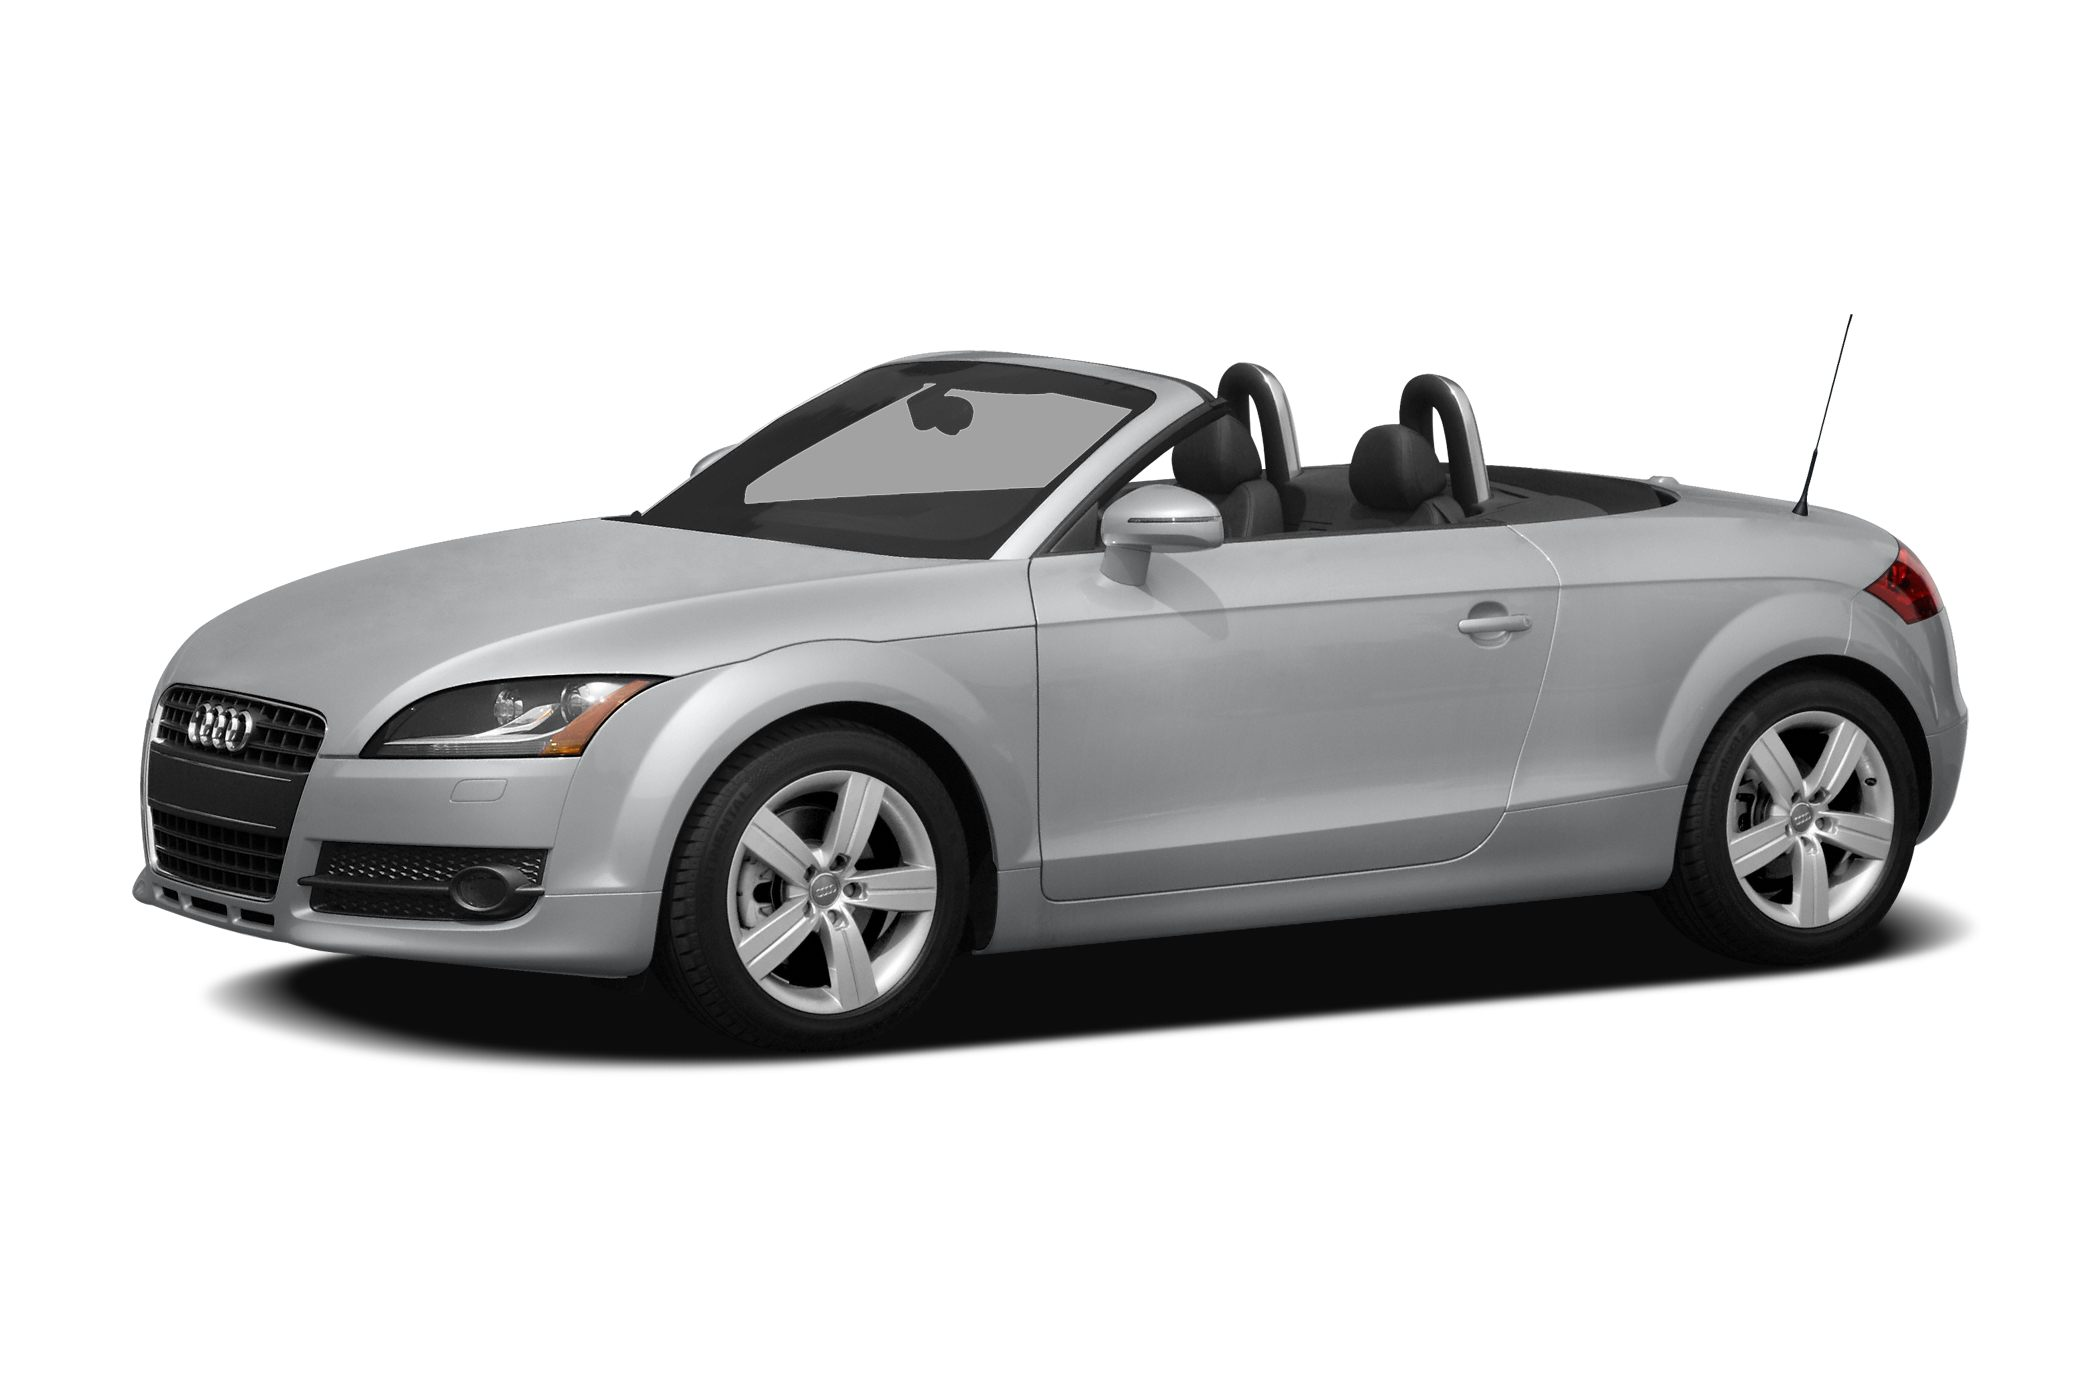 2010 audi tt 2.0t premium 2dr all-wheel drive quattro roadster